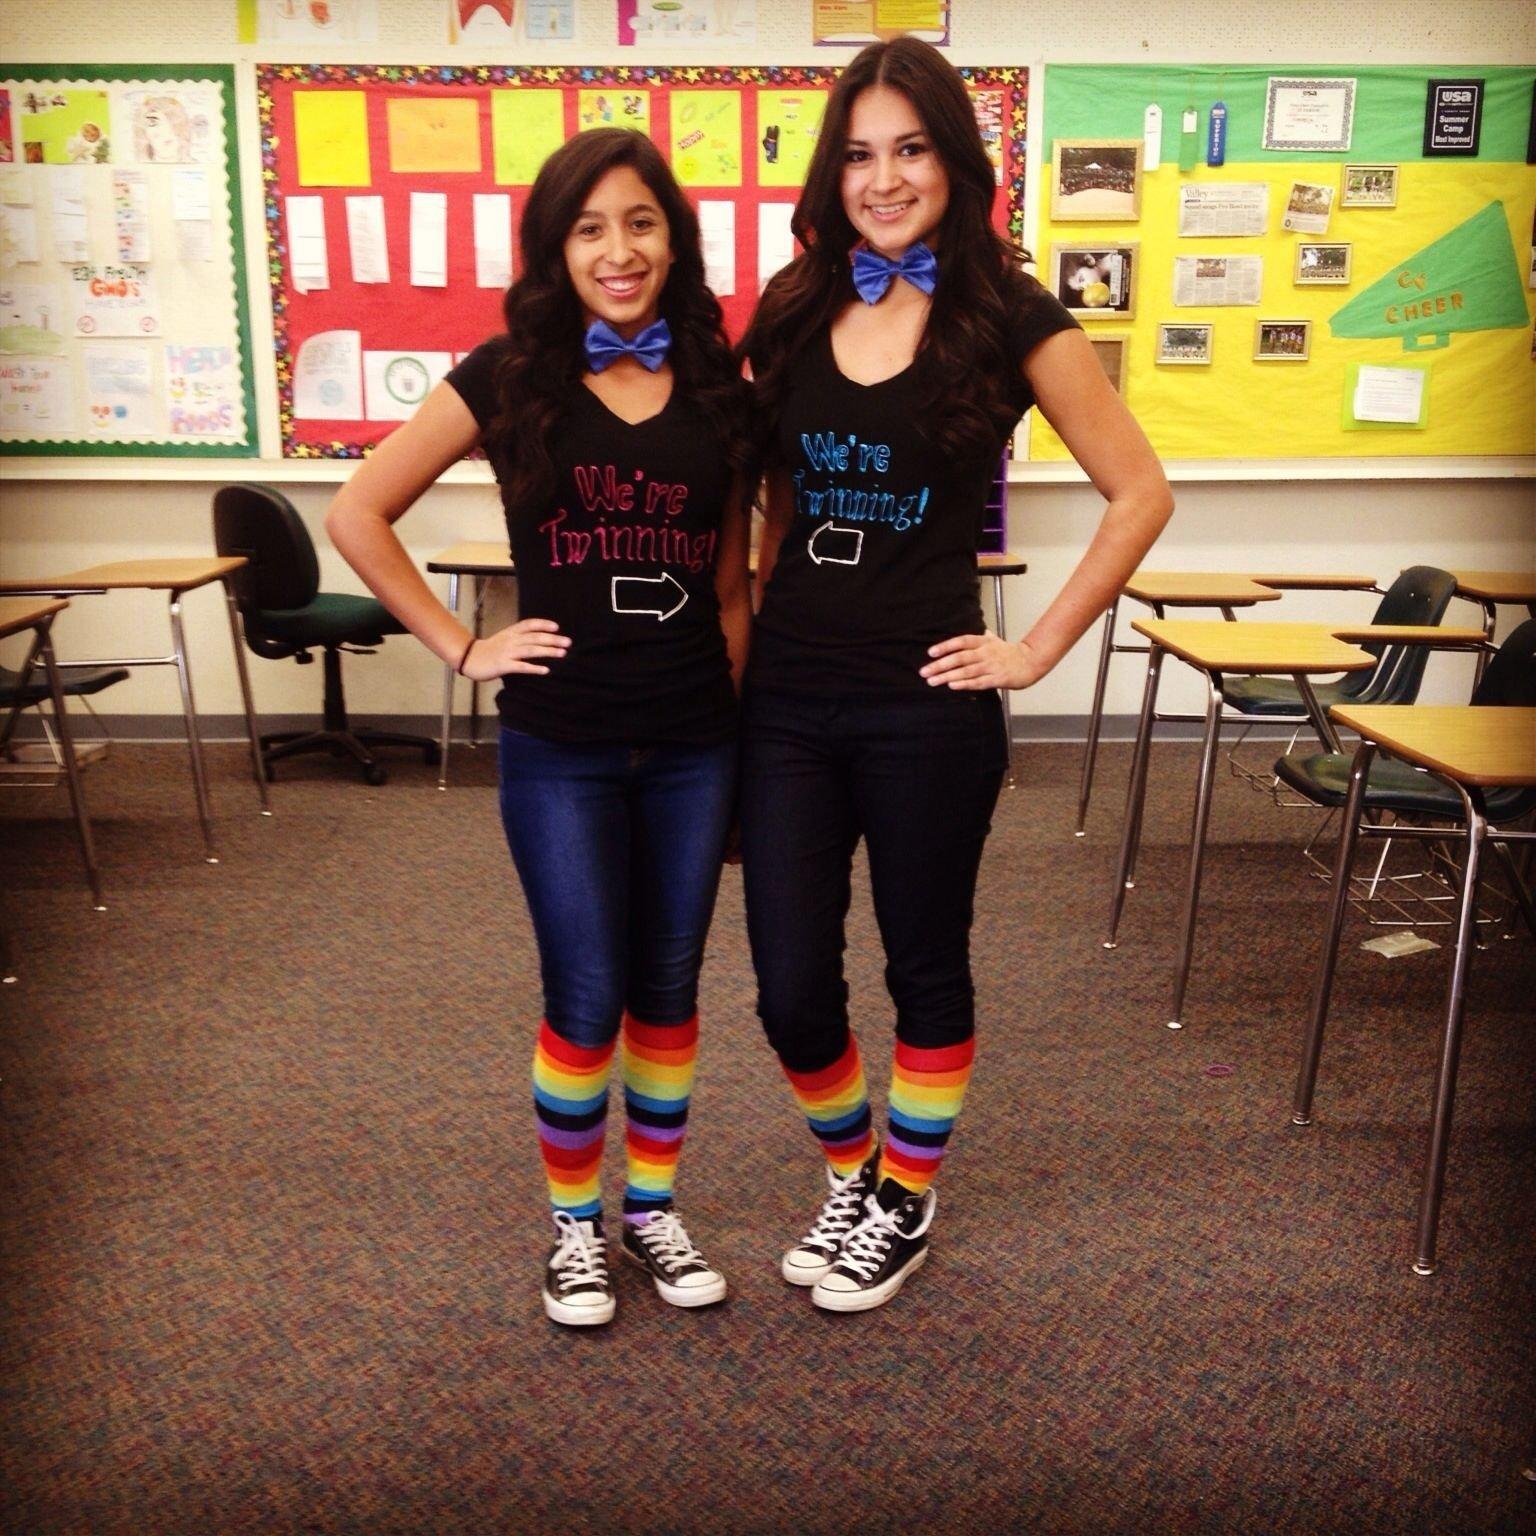 10 Perfect Twin Day Ideas For Spirit Week twin day spirit week at school my lifee29da4 pinterest twins 14 2020